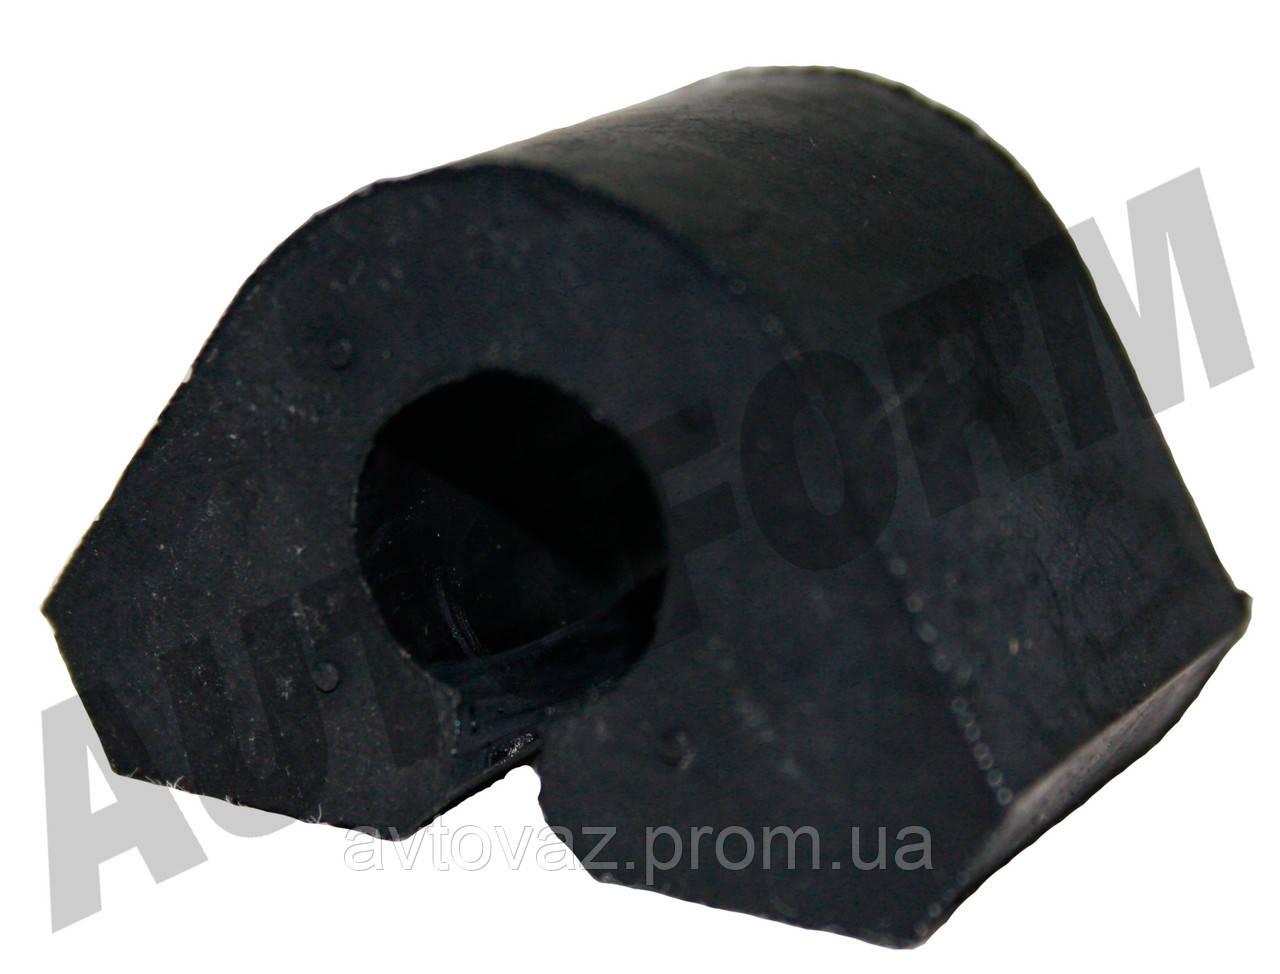 Подушка стабилизатора ВАЗ 1118 Калина задняя